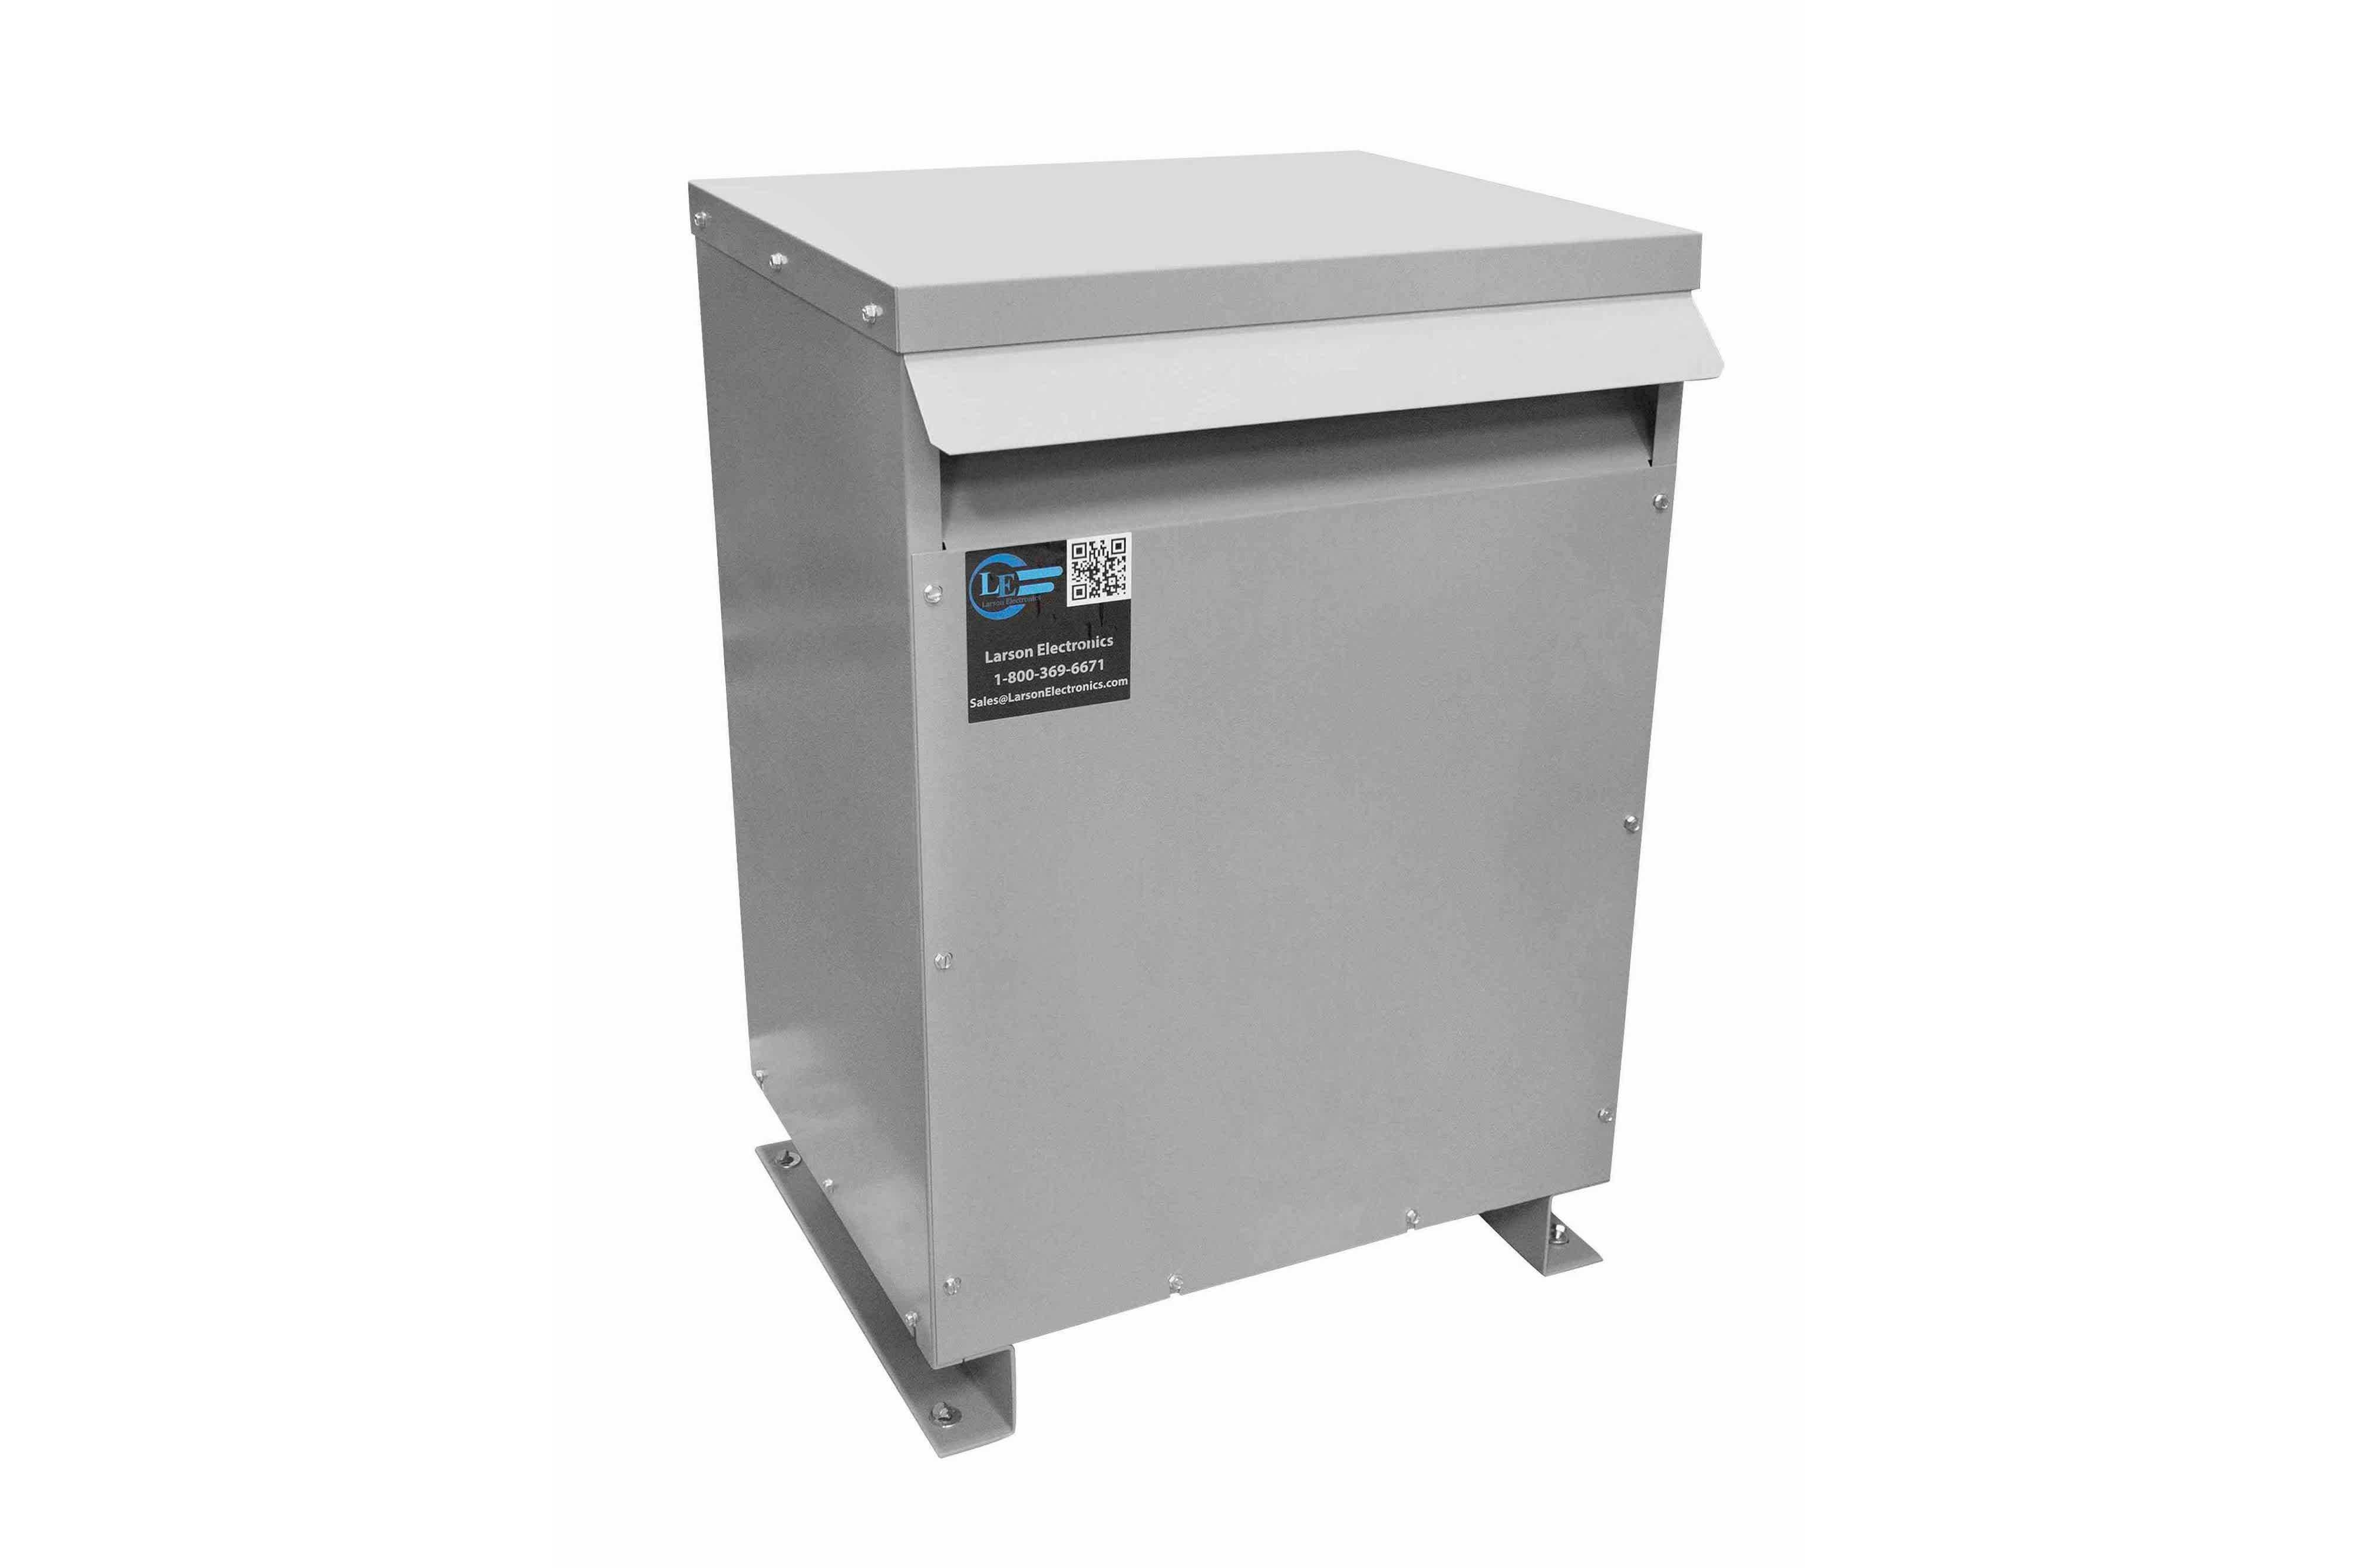 11 kVA 3PH Isolation Transformer, 600V Wye Primary, 415Y/240 Wye-N Secondary, N3R, Ventilated, 60 Hz